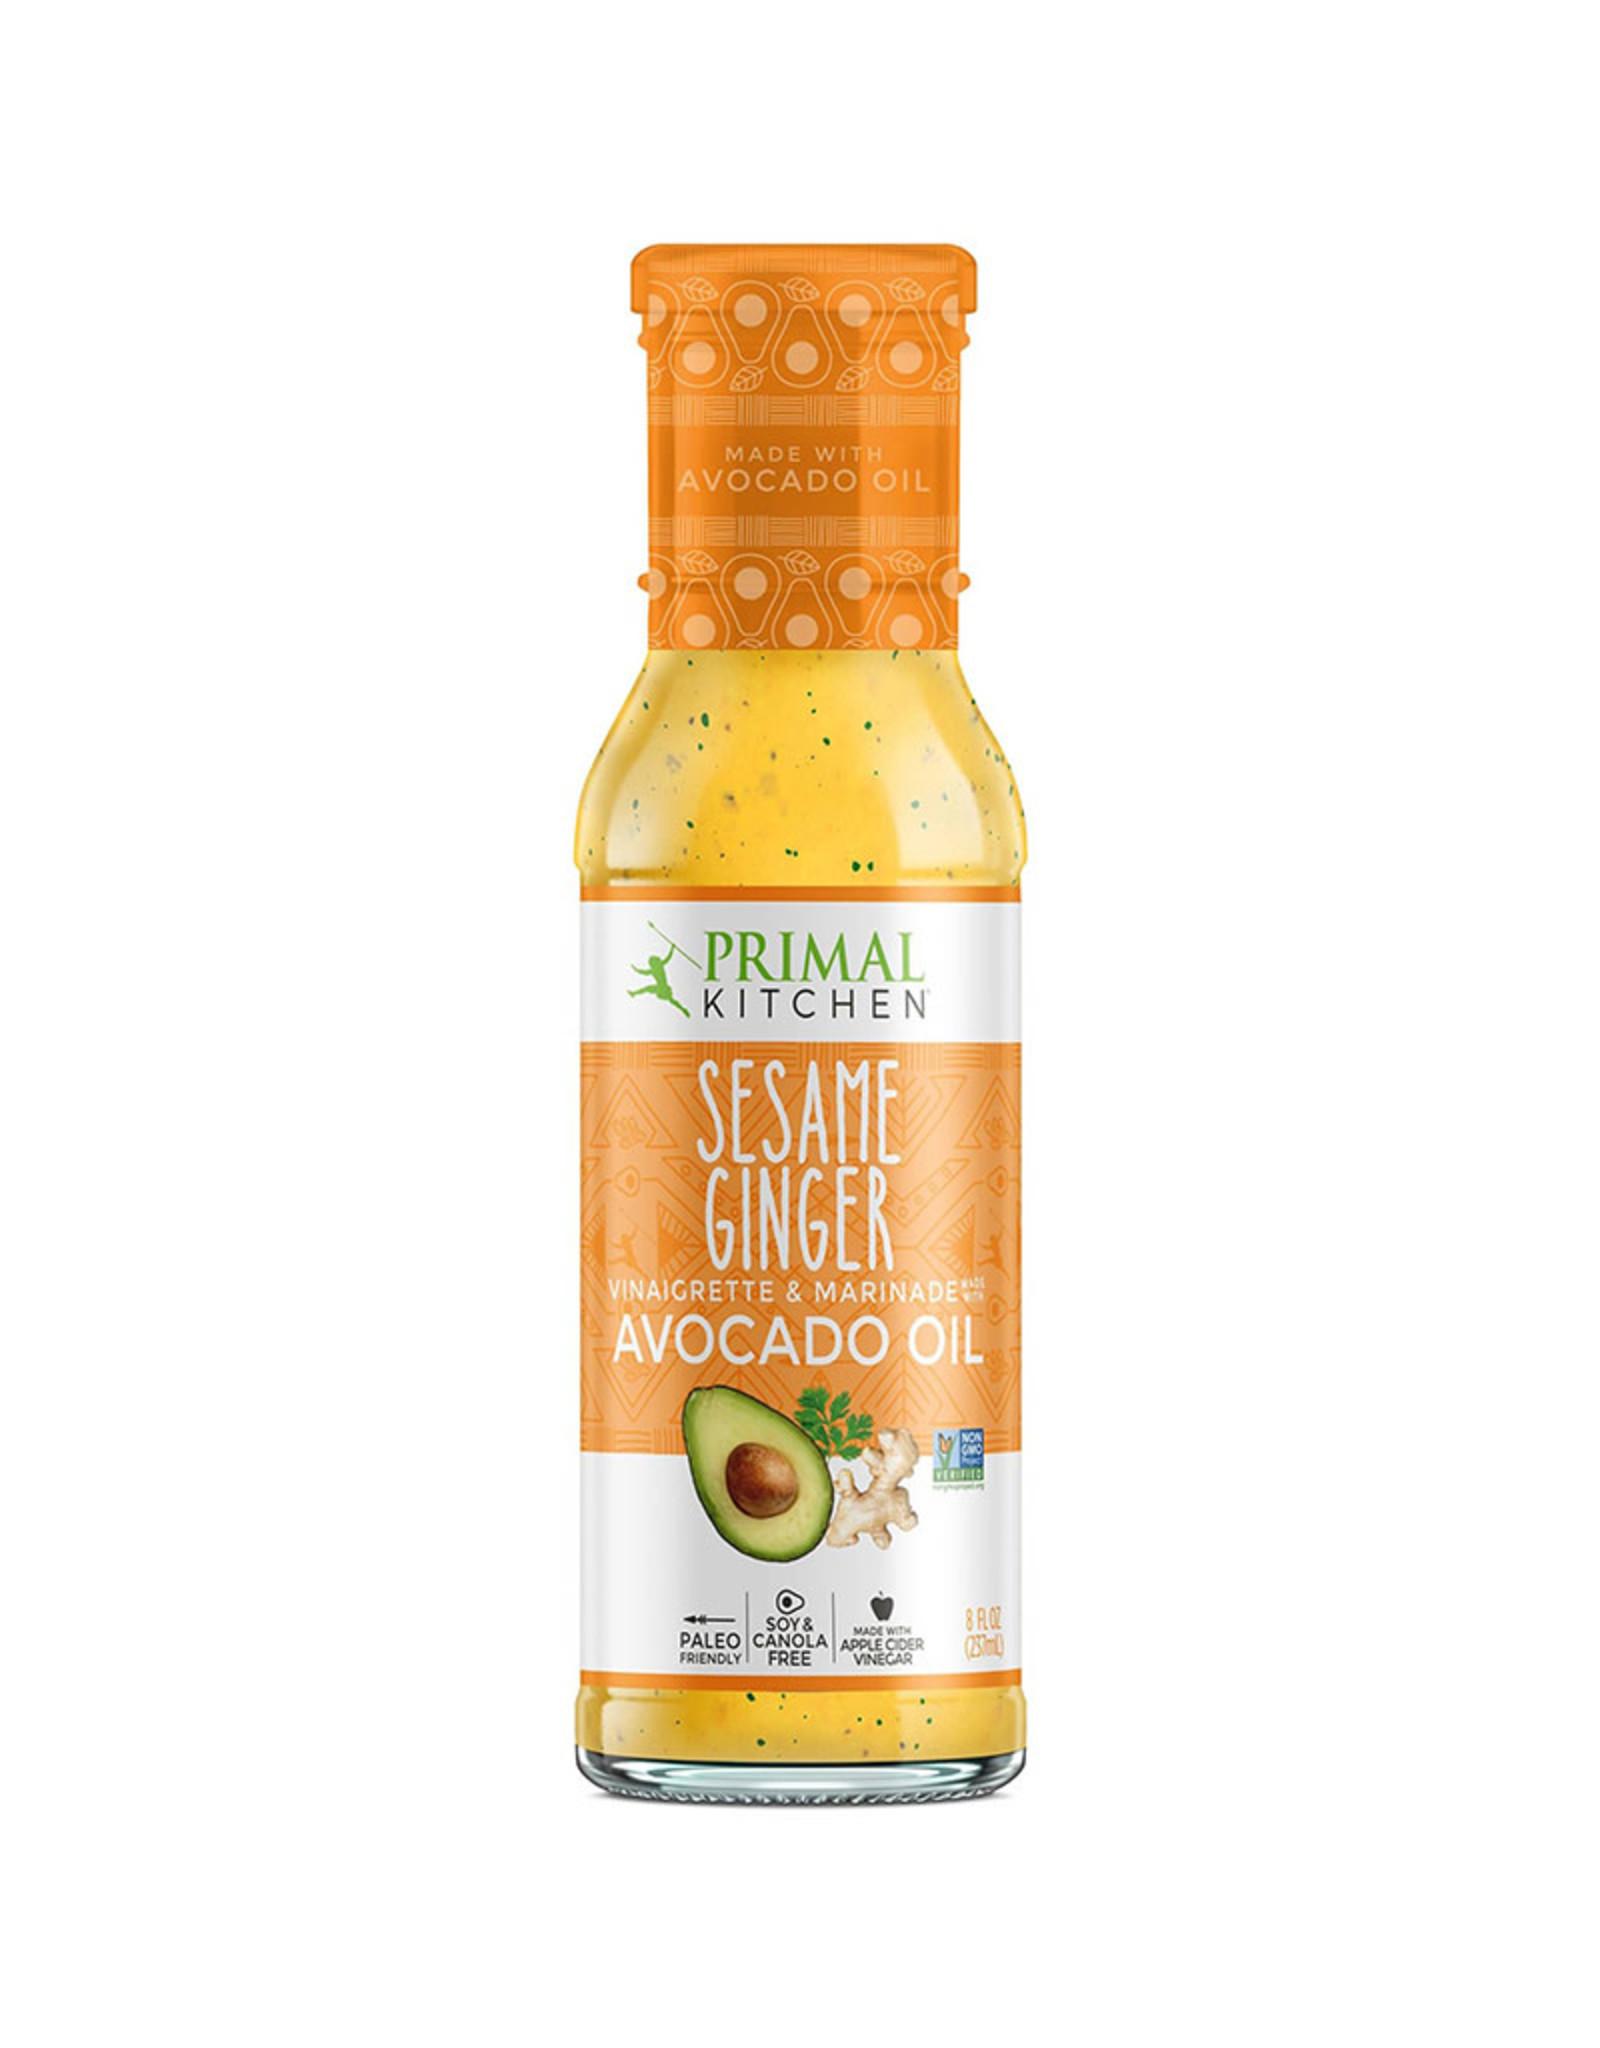 Primal Kitchen Primal Kitchen - Dressing, Sesame Ginger Vinaigrette (237ml)